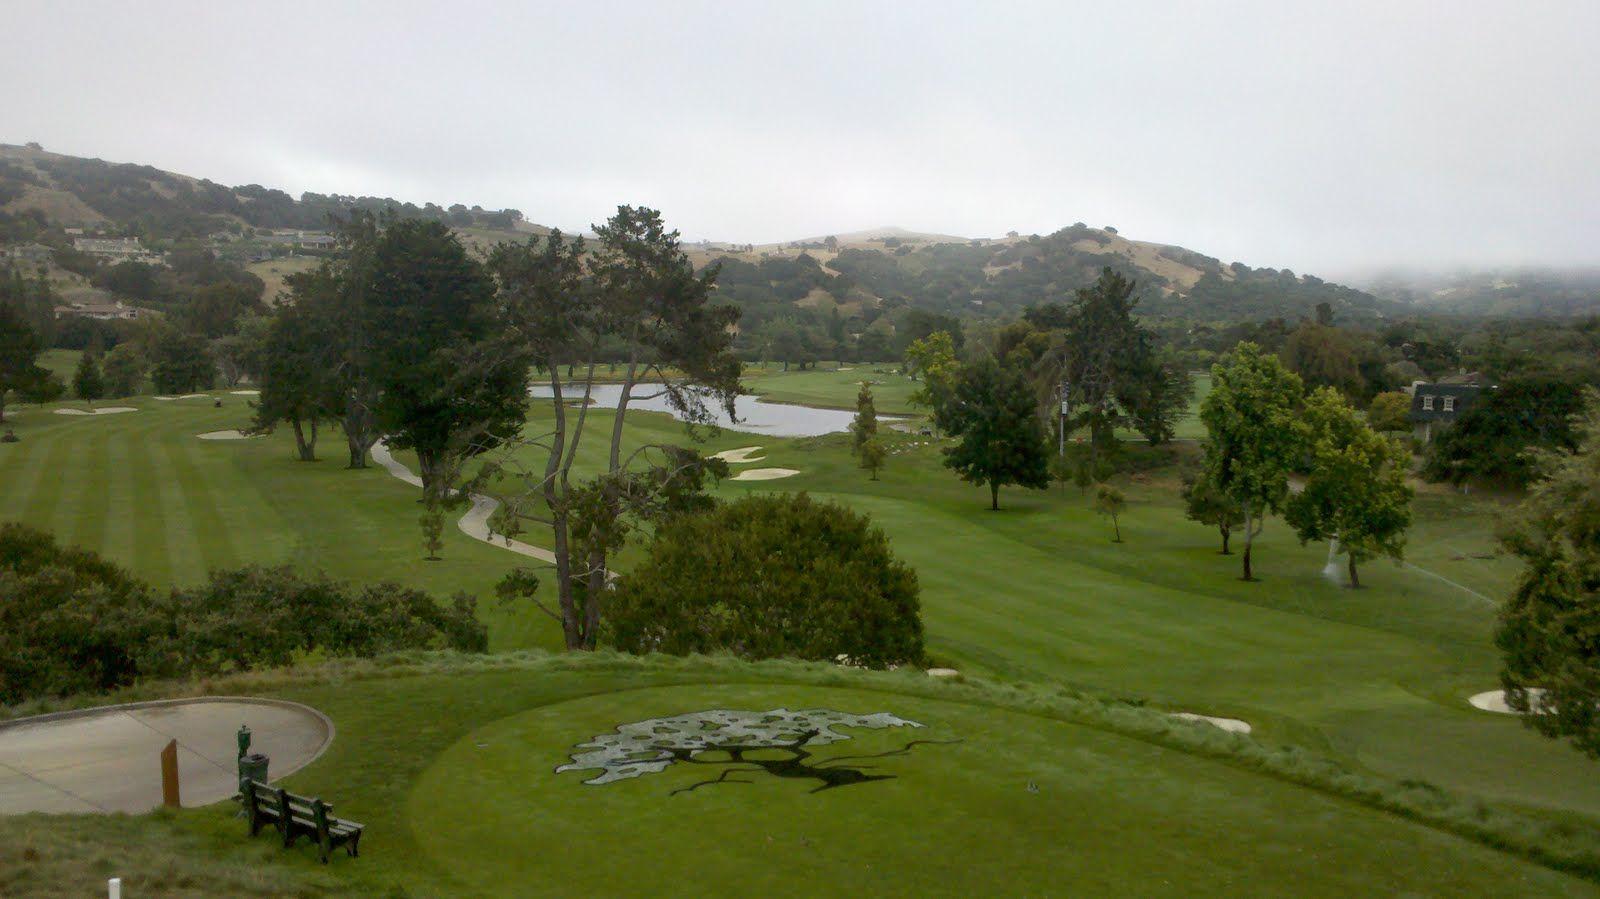 Corral De Tierra Country Club Golf Salinas Ca Golf Courses Golf Scenery